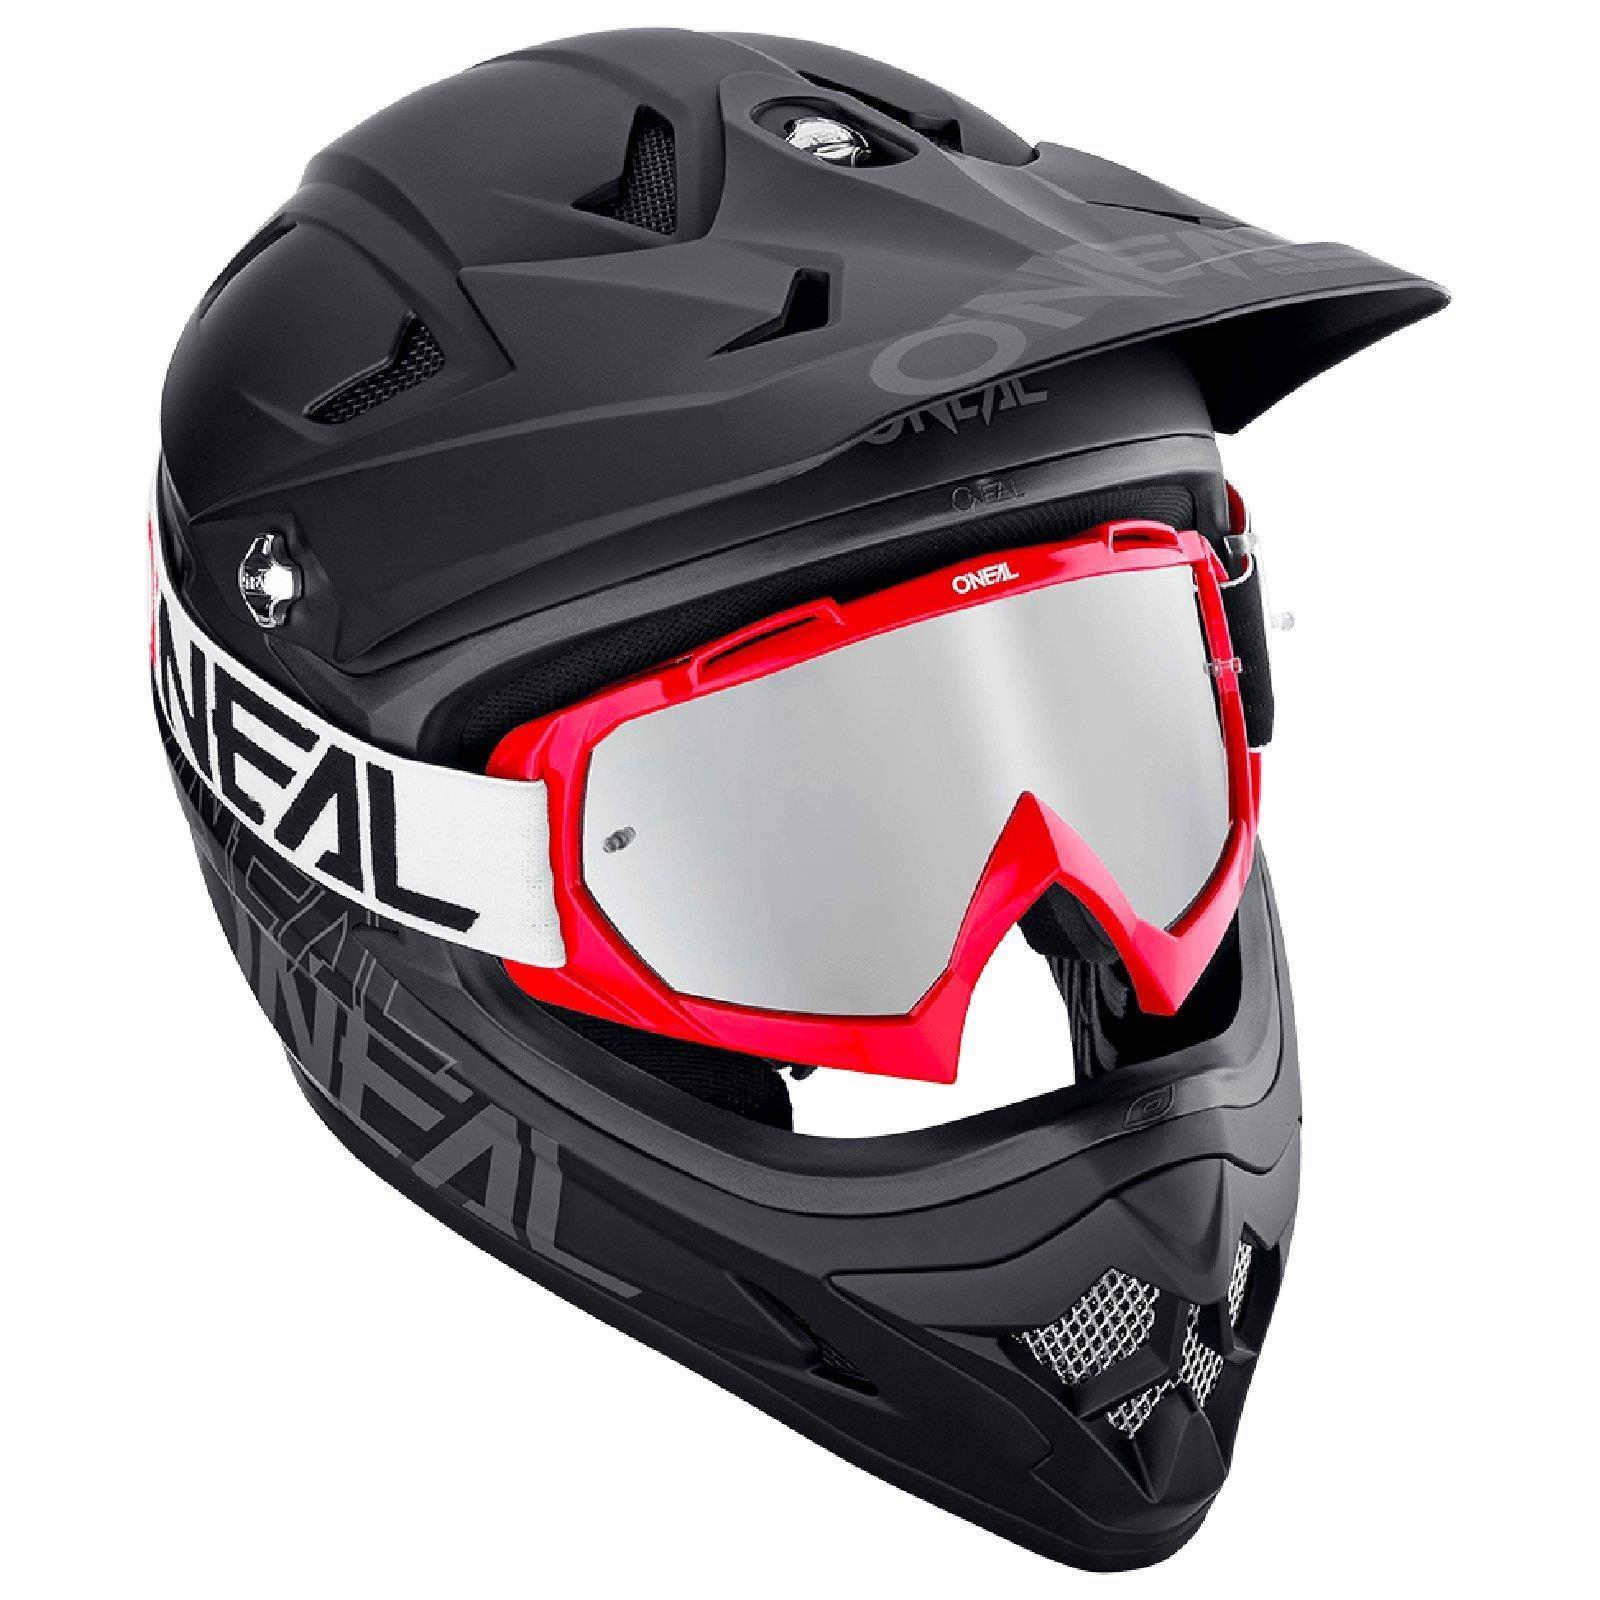 miniatuur 11 - O'Neal B-10 Goggle Twoface MX Brille Verspiegelt Silber Moto Cross Downhill MTB